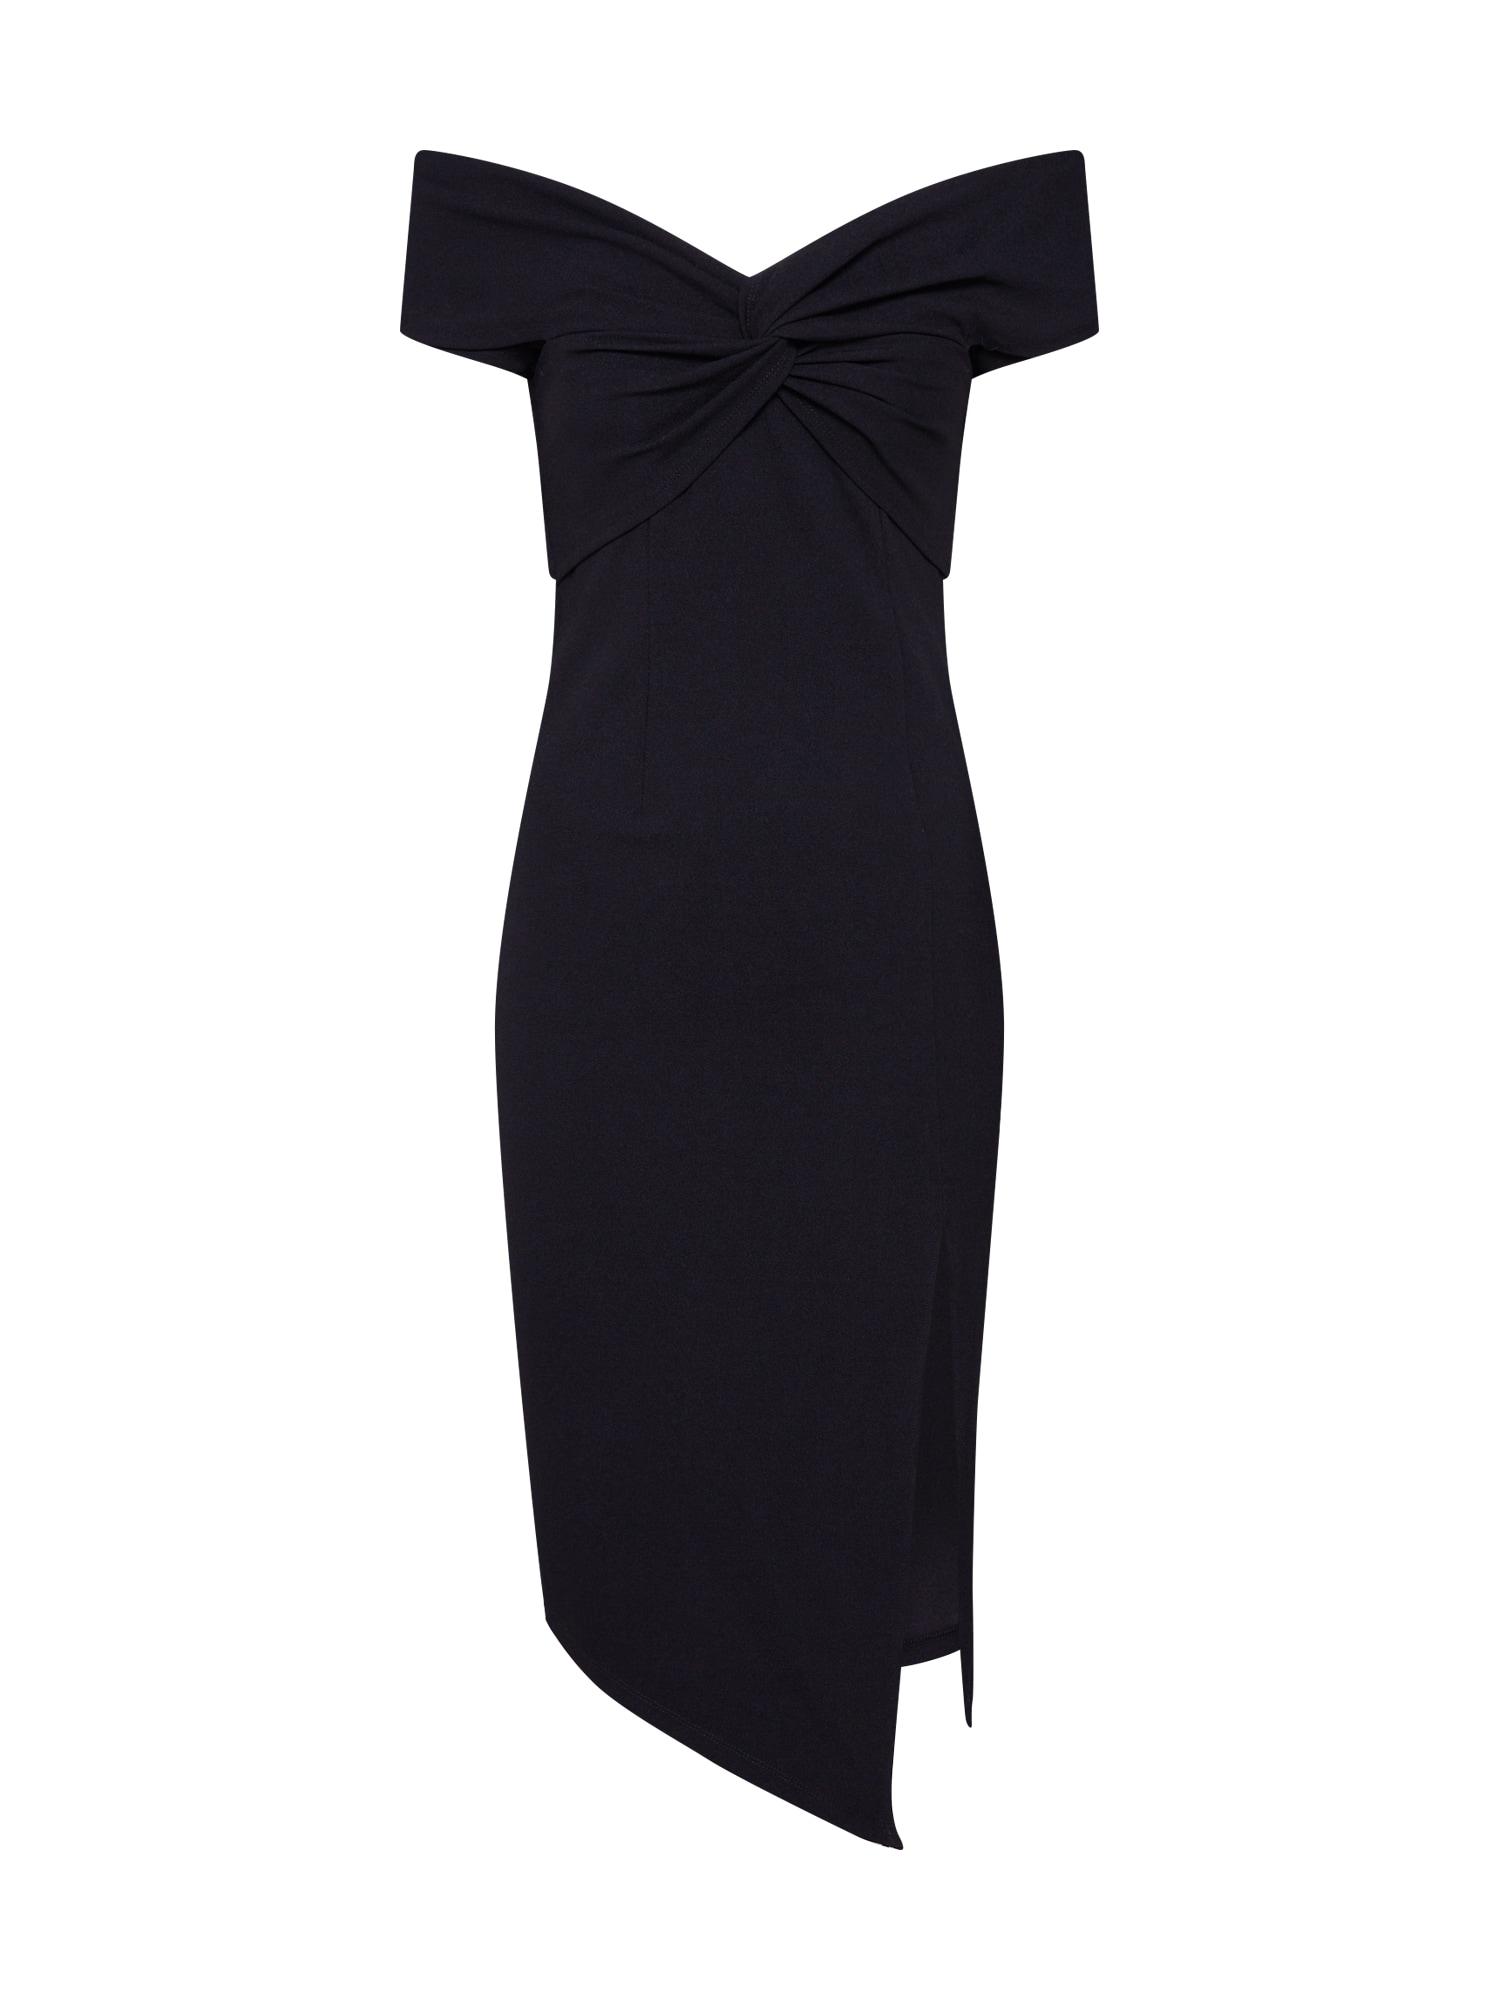 Parallel Lines Sukienka koktajlowa 'TWIST FRONT MIDI DRESS'  czarny